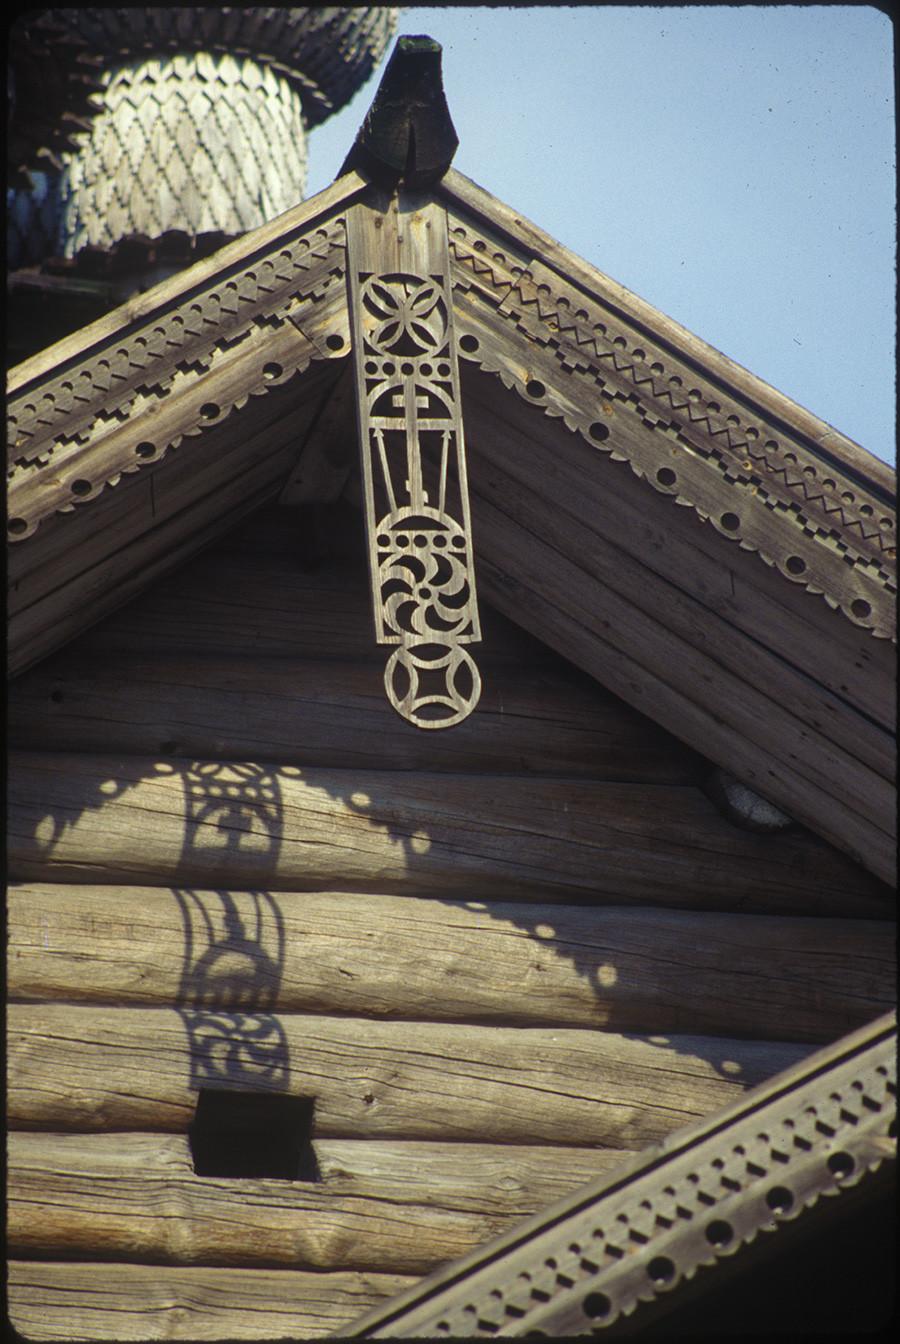 Iglesia de la Intercesión. Fachada oeste con talla decorativa (signo solar, cruz e instrumentos de la Pasión de Cristo). 6 de agosto de 1991